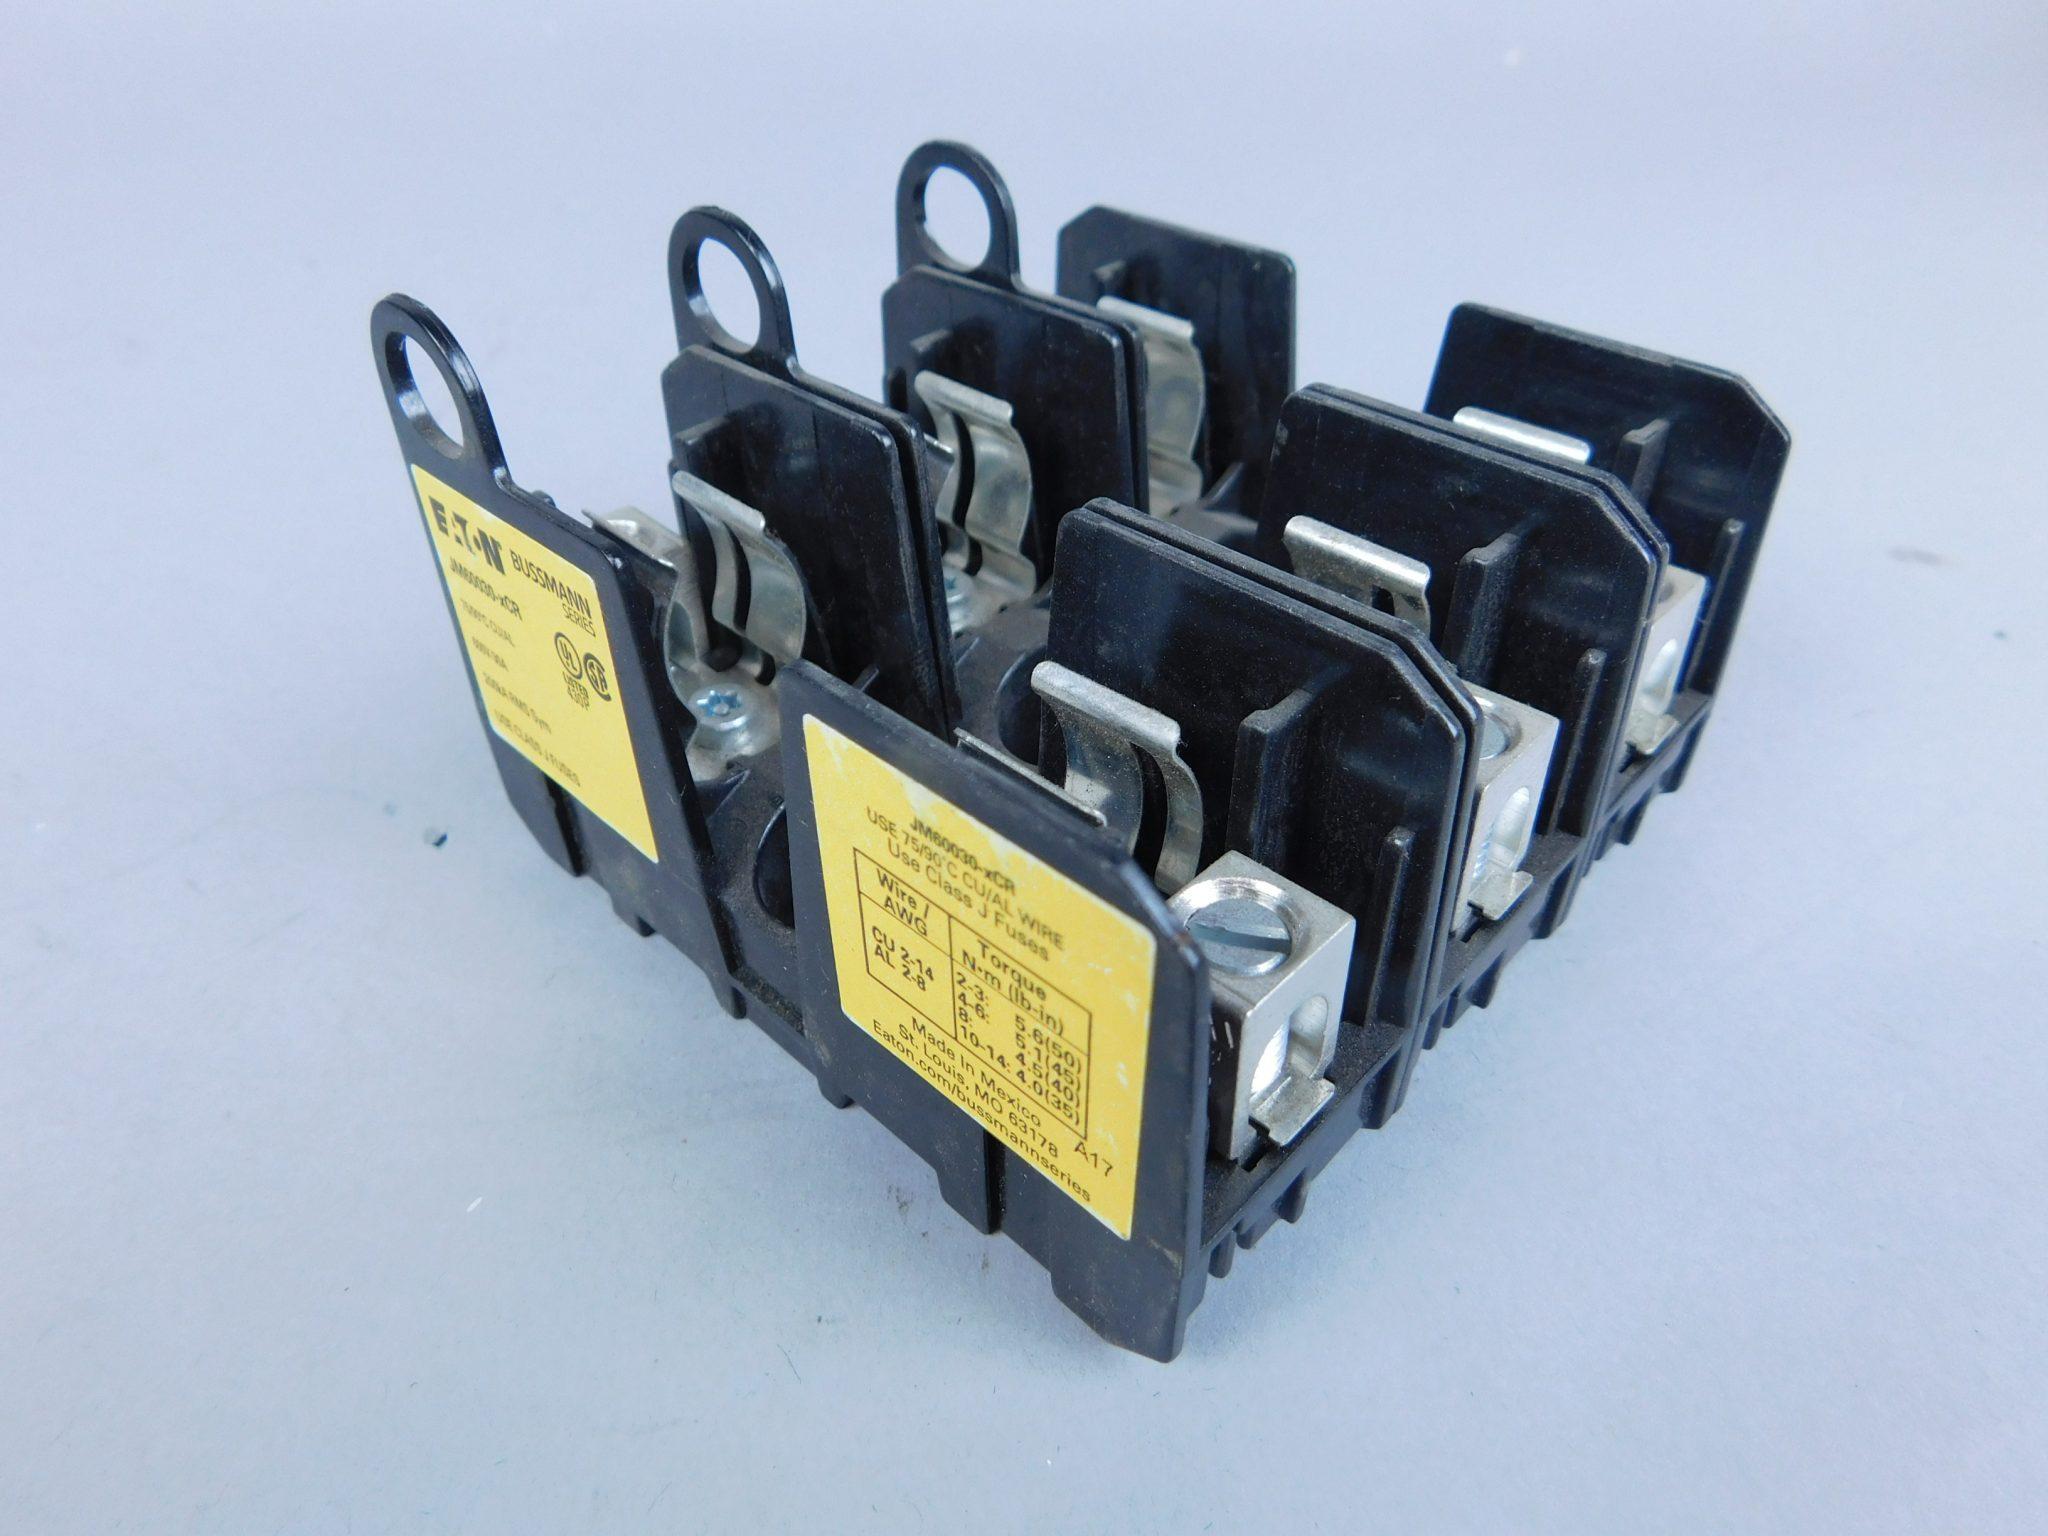 Eaton JM60030-xCR Edison Modular Fuse Block Bussmann Series 600V-30A on